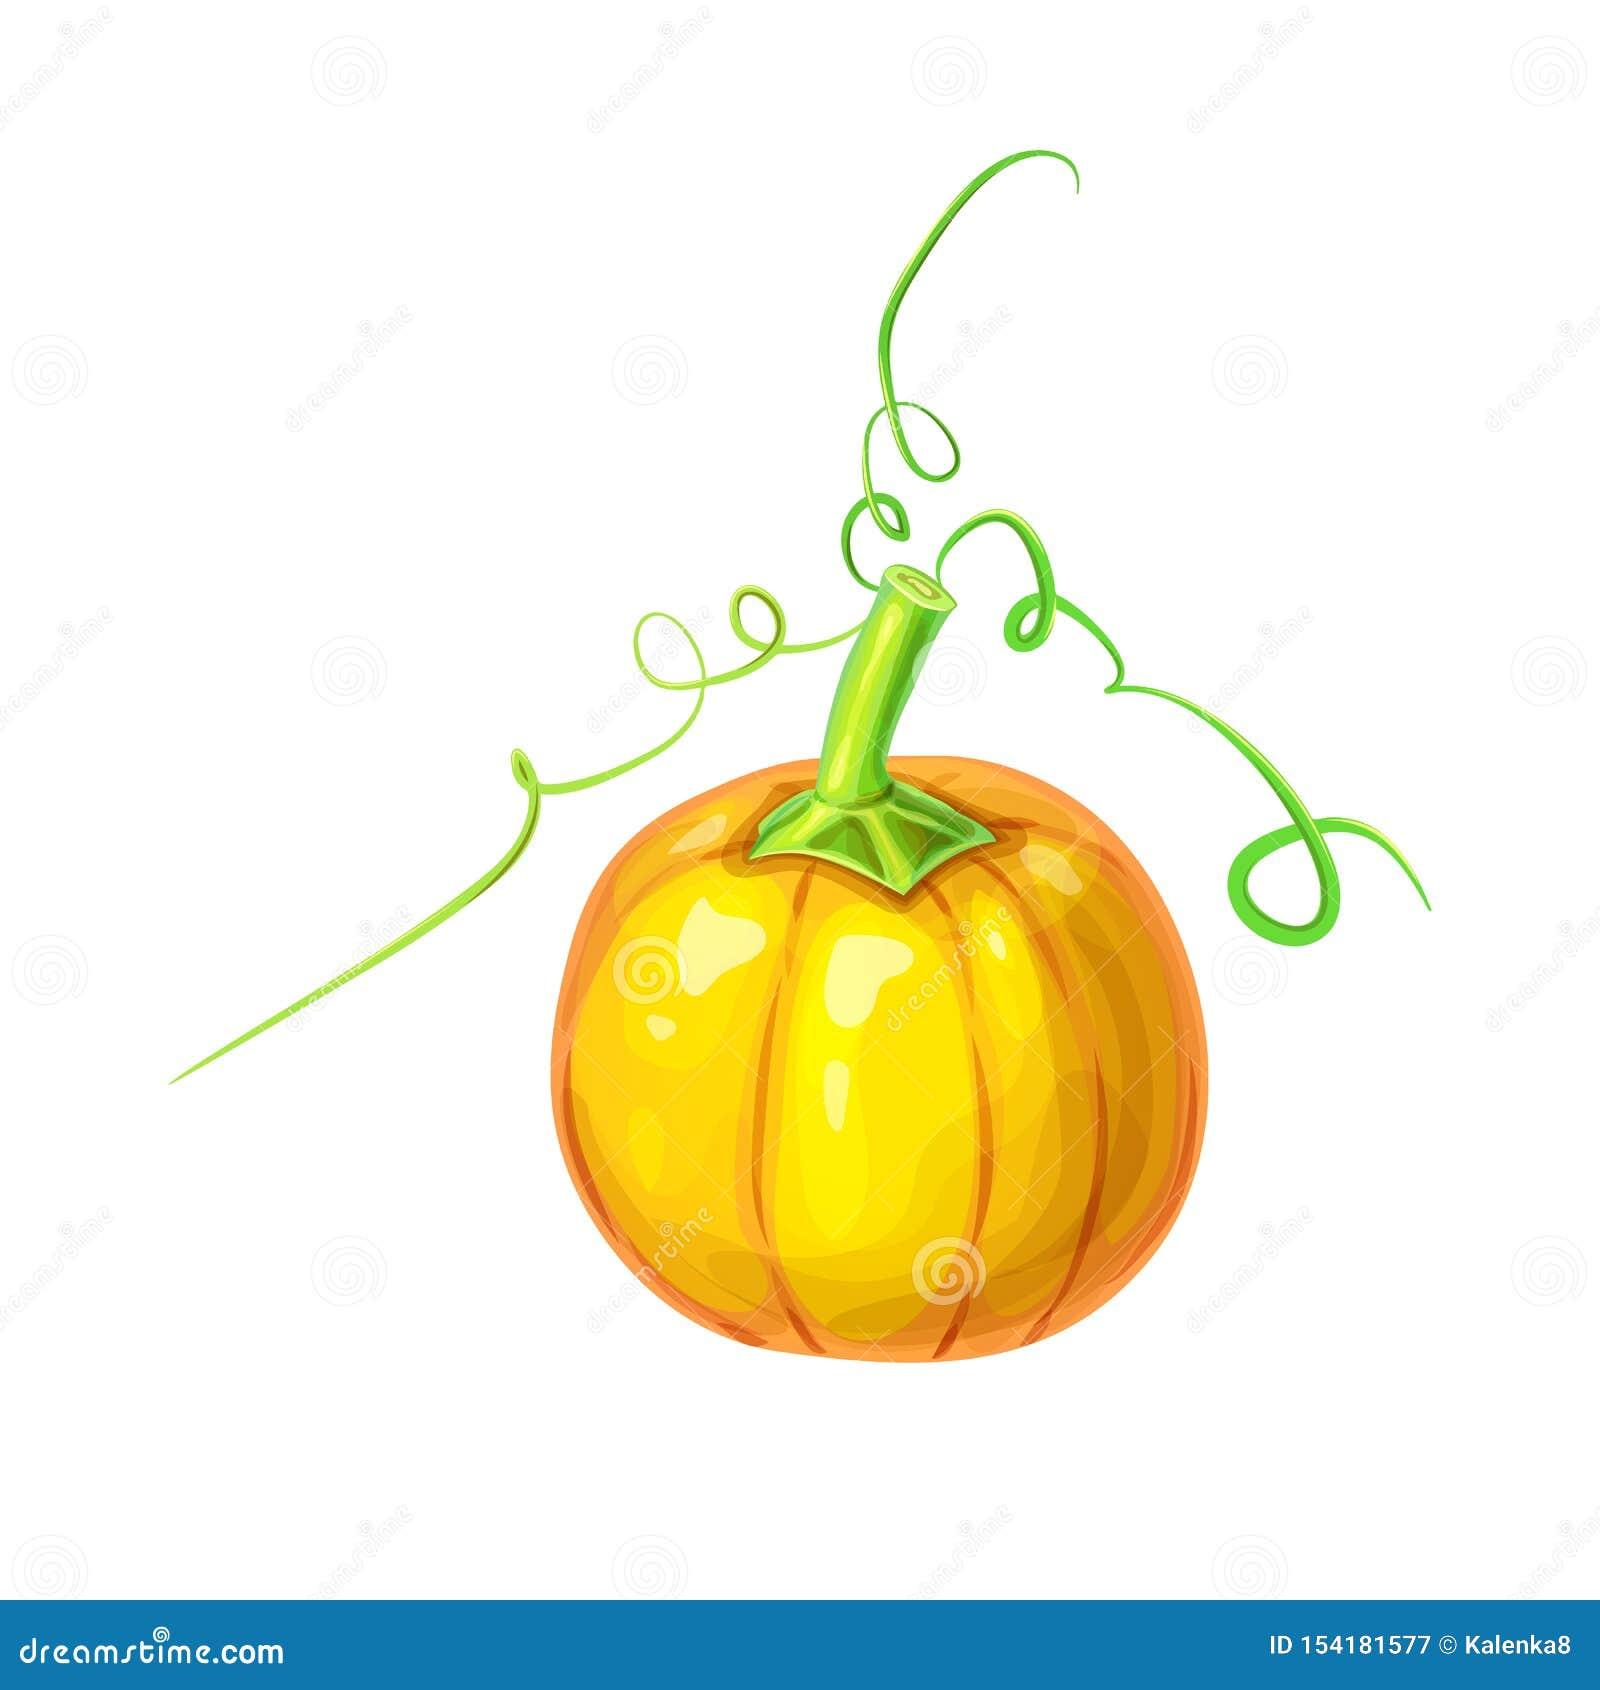 Curly Pumpkin Stem Stock Illustrations 54 Curly Pumpkin Stem Stock Illustrations Vectors Clipart Dreamstime